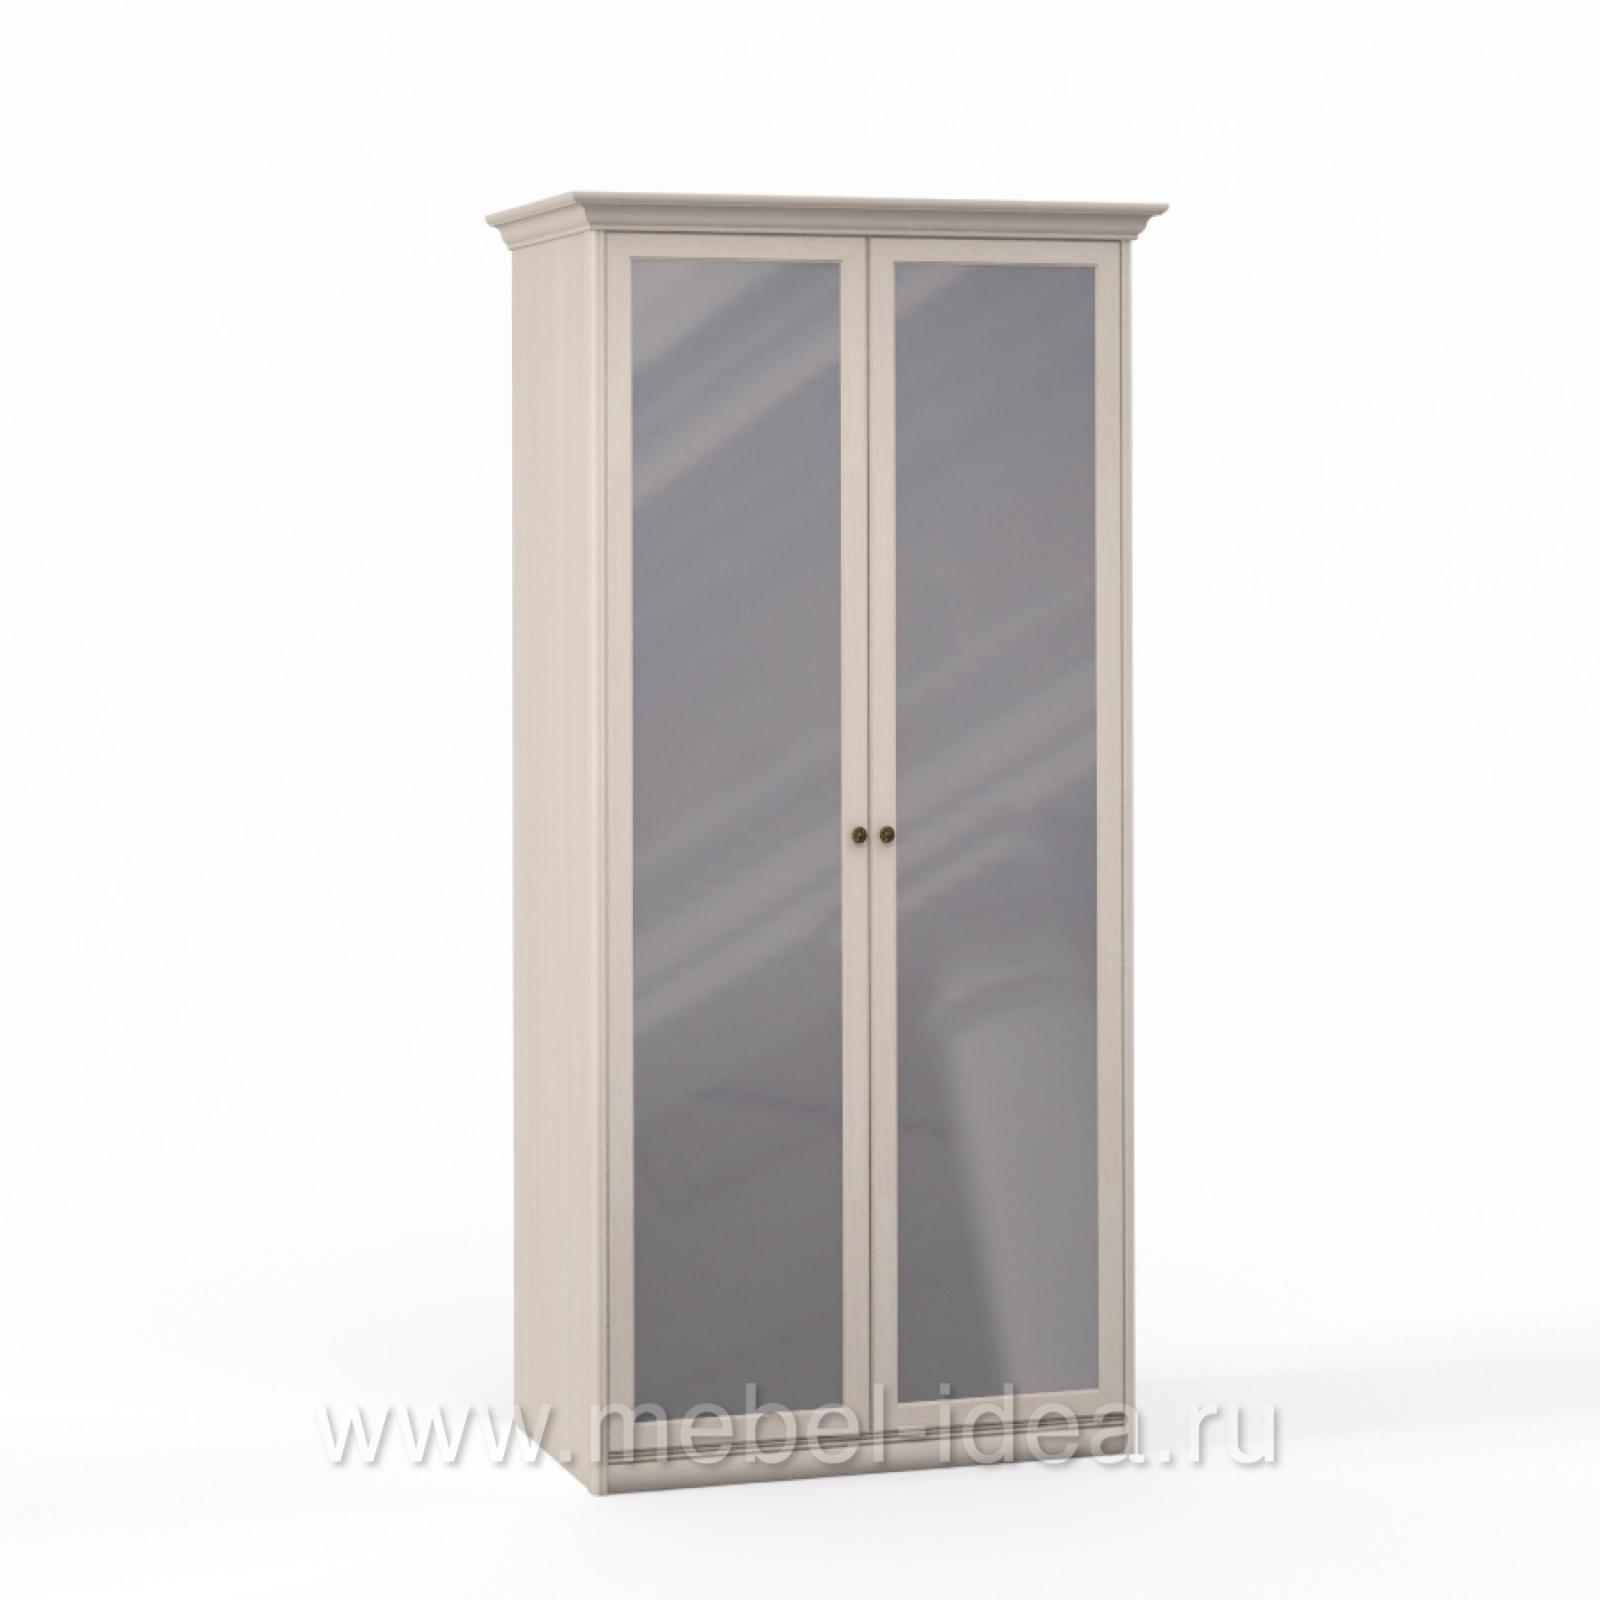 """Лючия светлая"" Шкаф 2 дв. с зерк. - 3537"